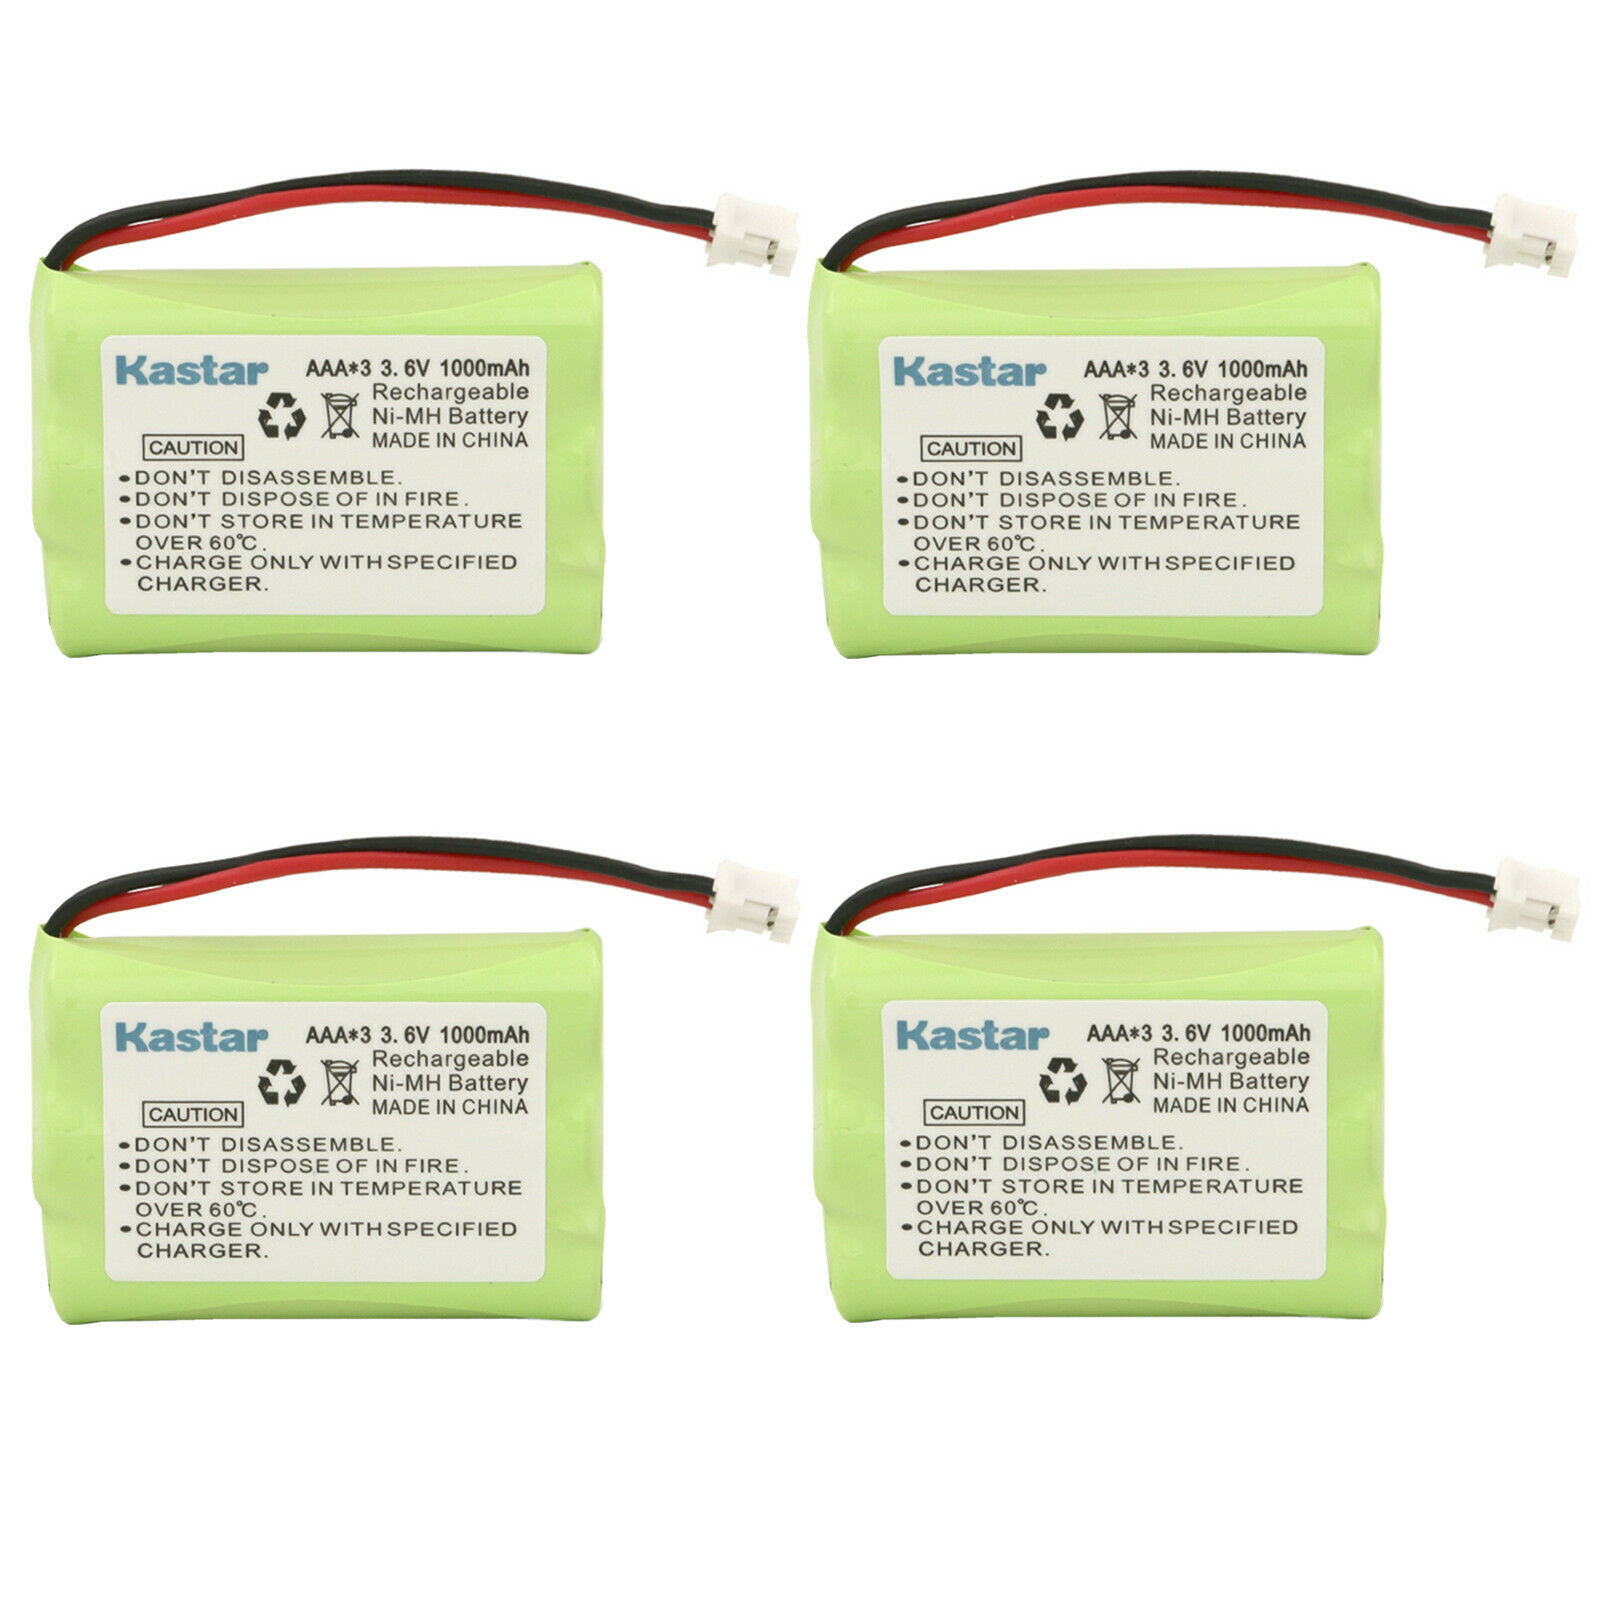 3SN-AAA75H-S-JP2 BATT-2795 Battery for Graco iMonitor Vibe and Evenflo Whisper